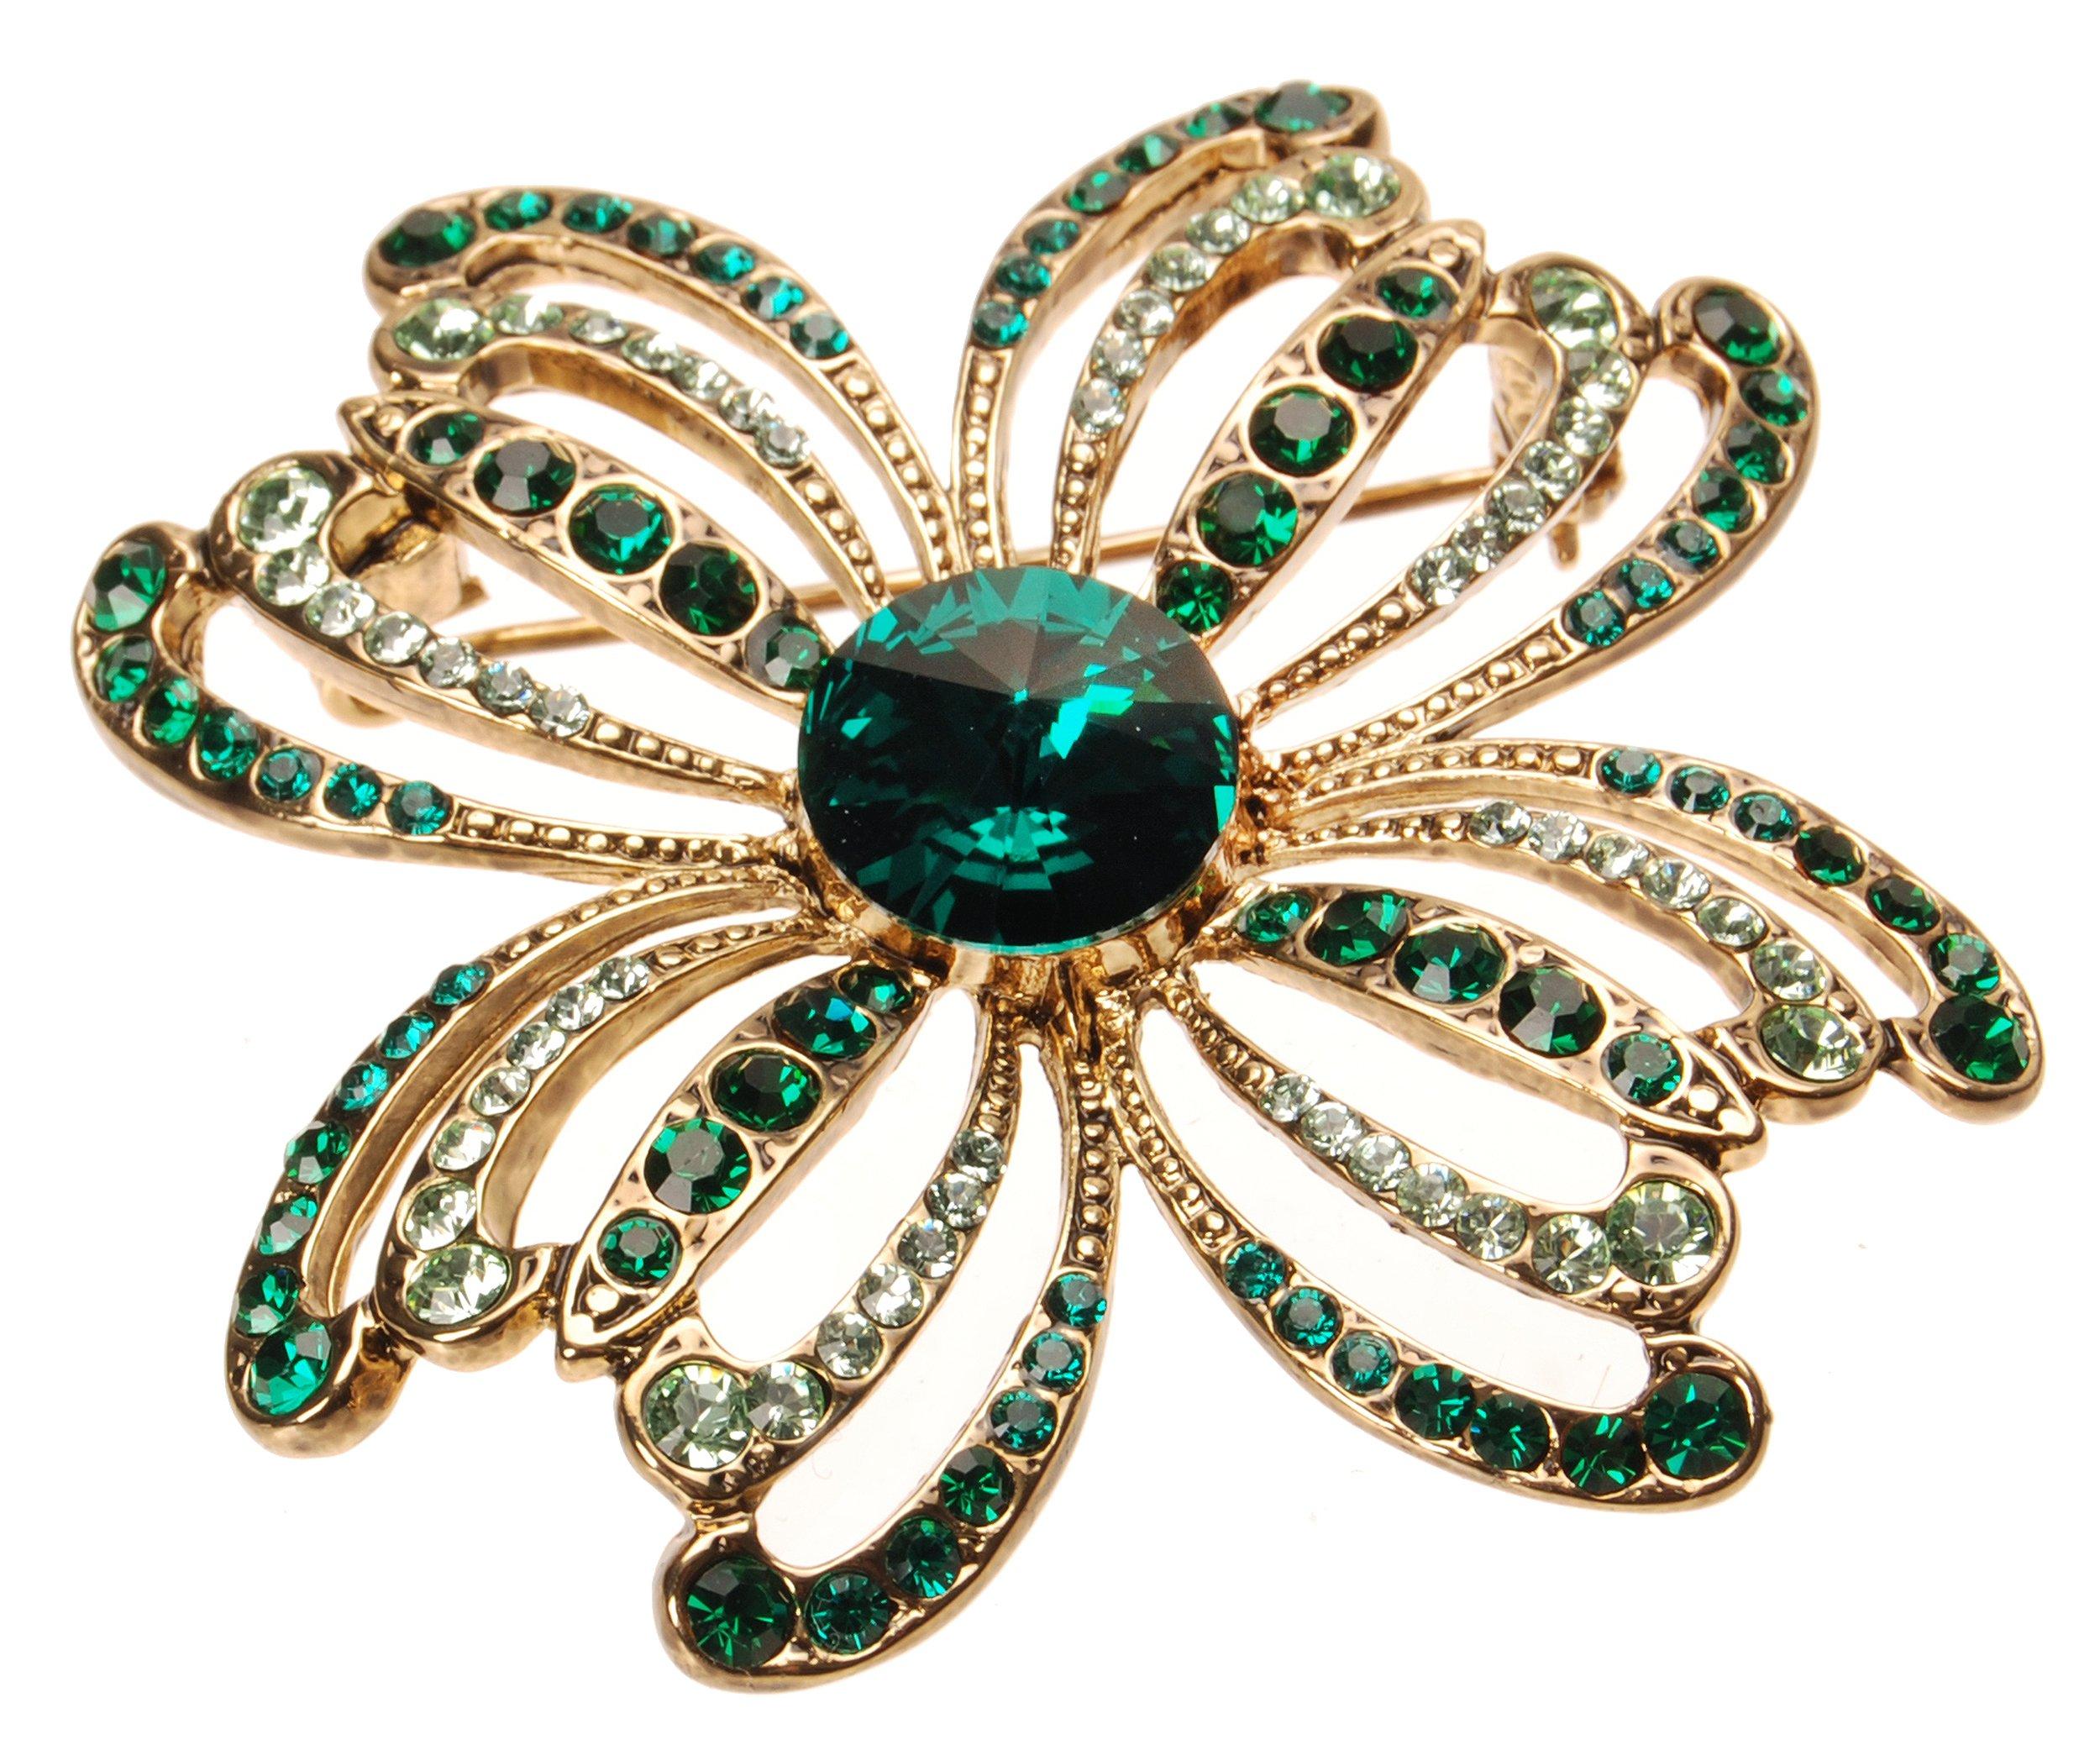 L. Erickson Crystal Clover Brooch - Fern Green/Emerald/Chrysolite/Antique Gold